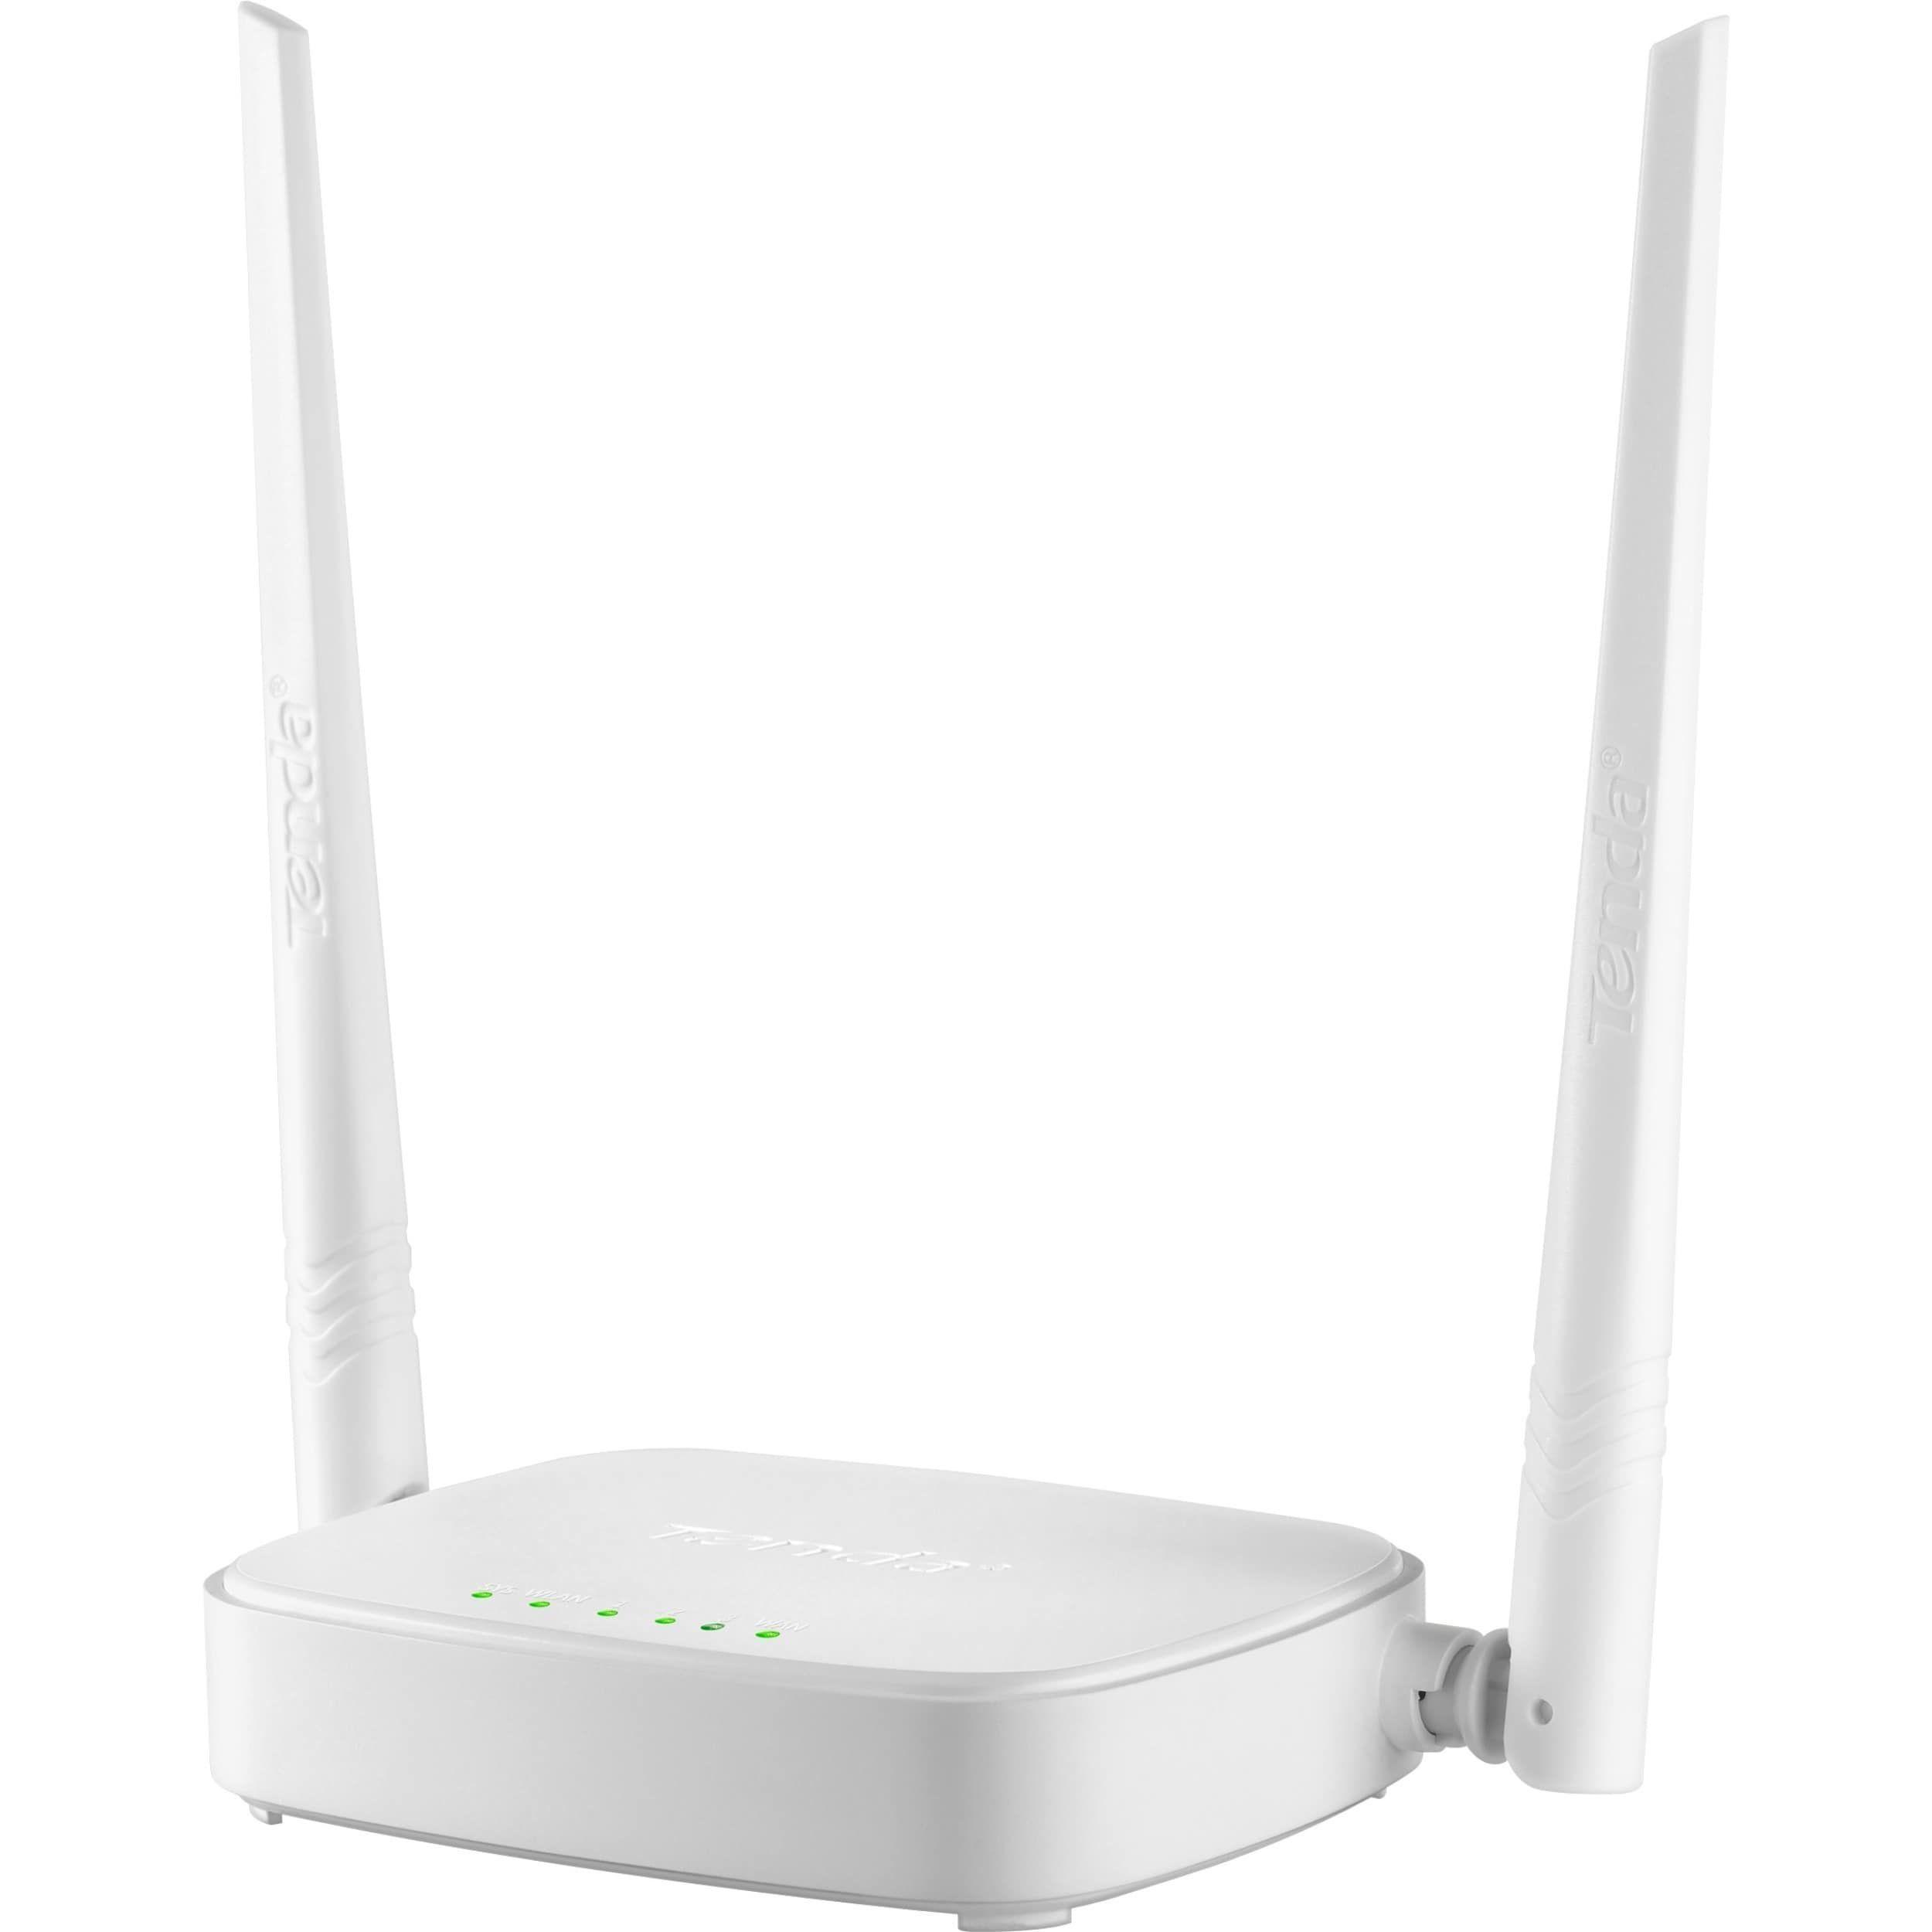 Tenda N301 N300 Wireless Easy Setup Router Router Wireless